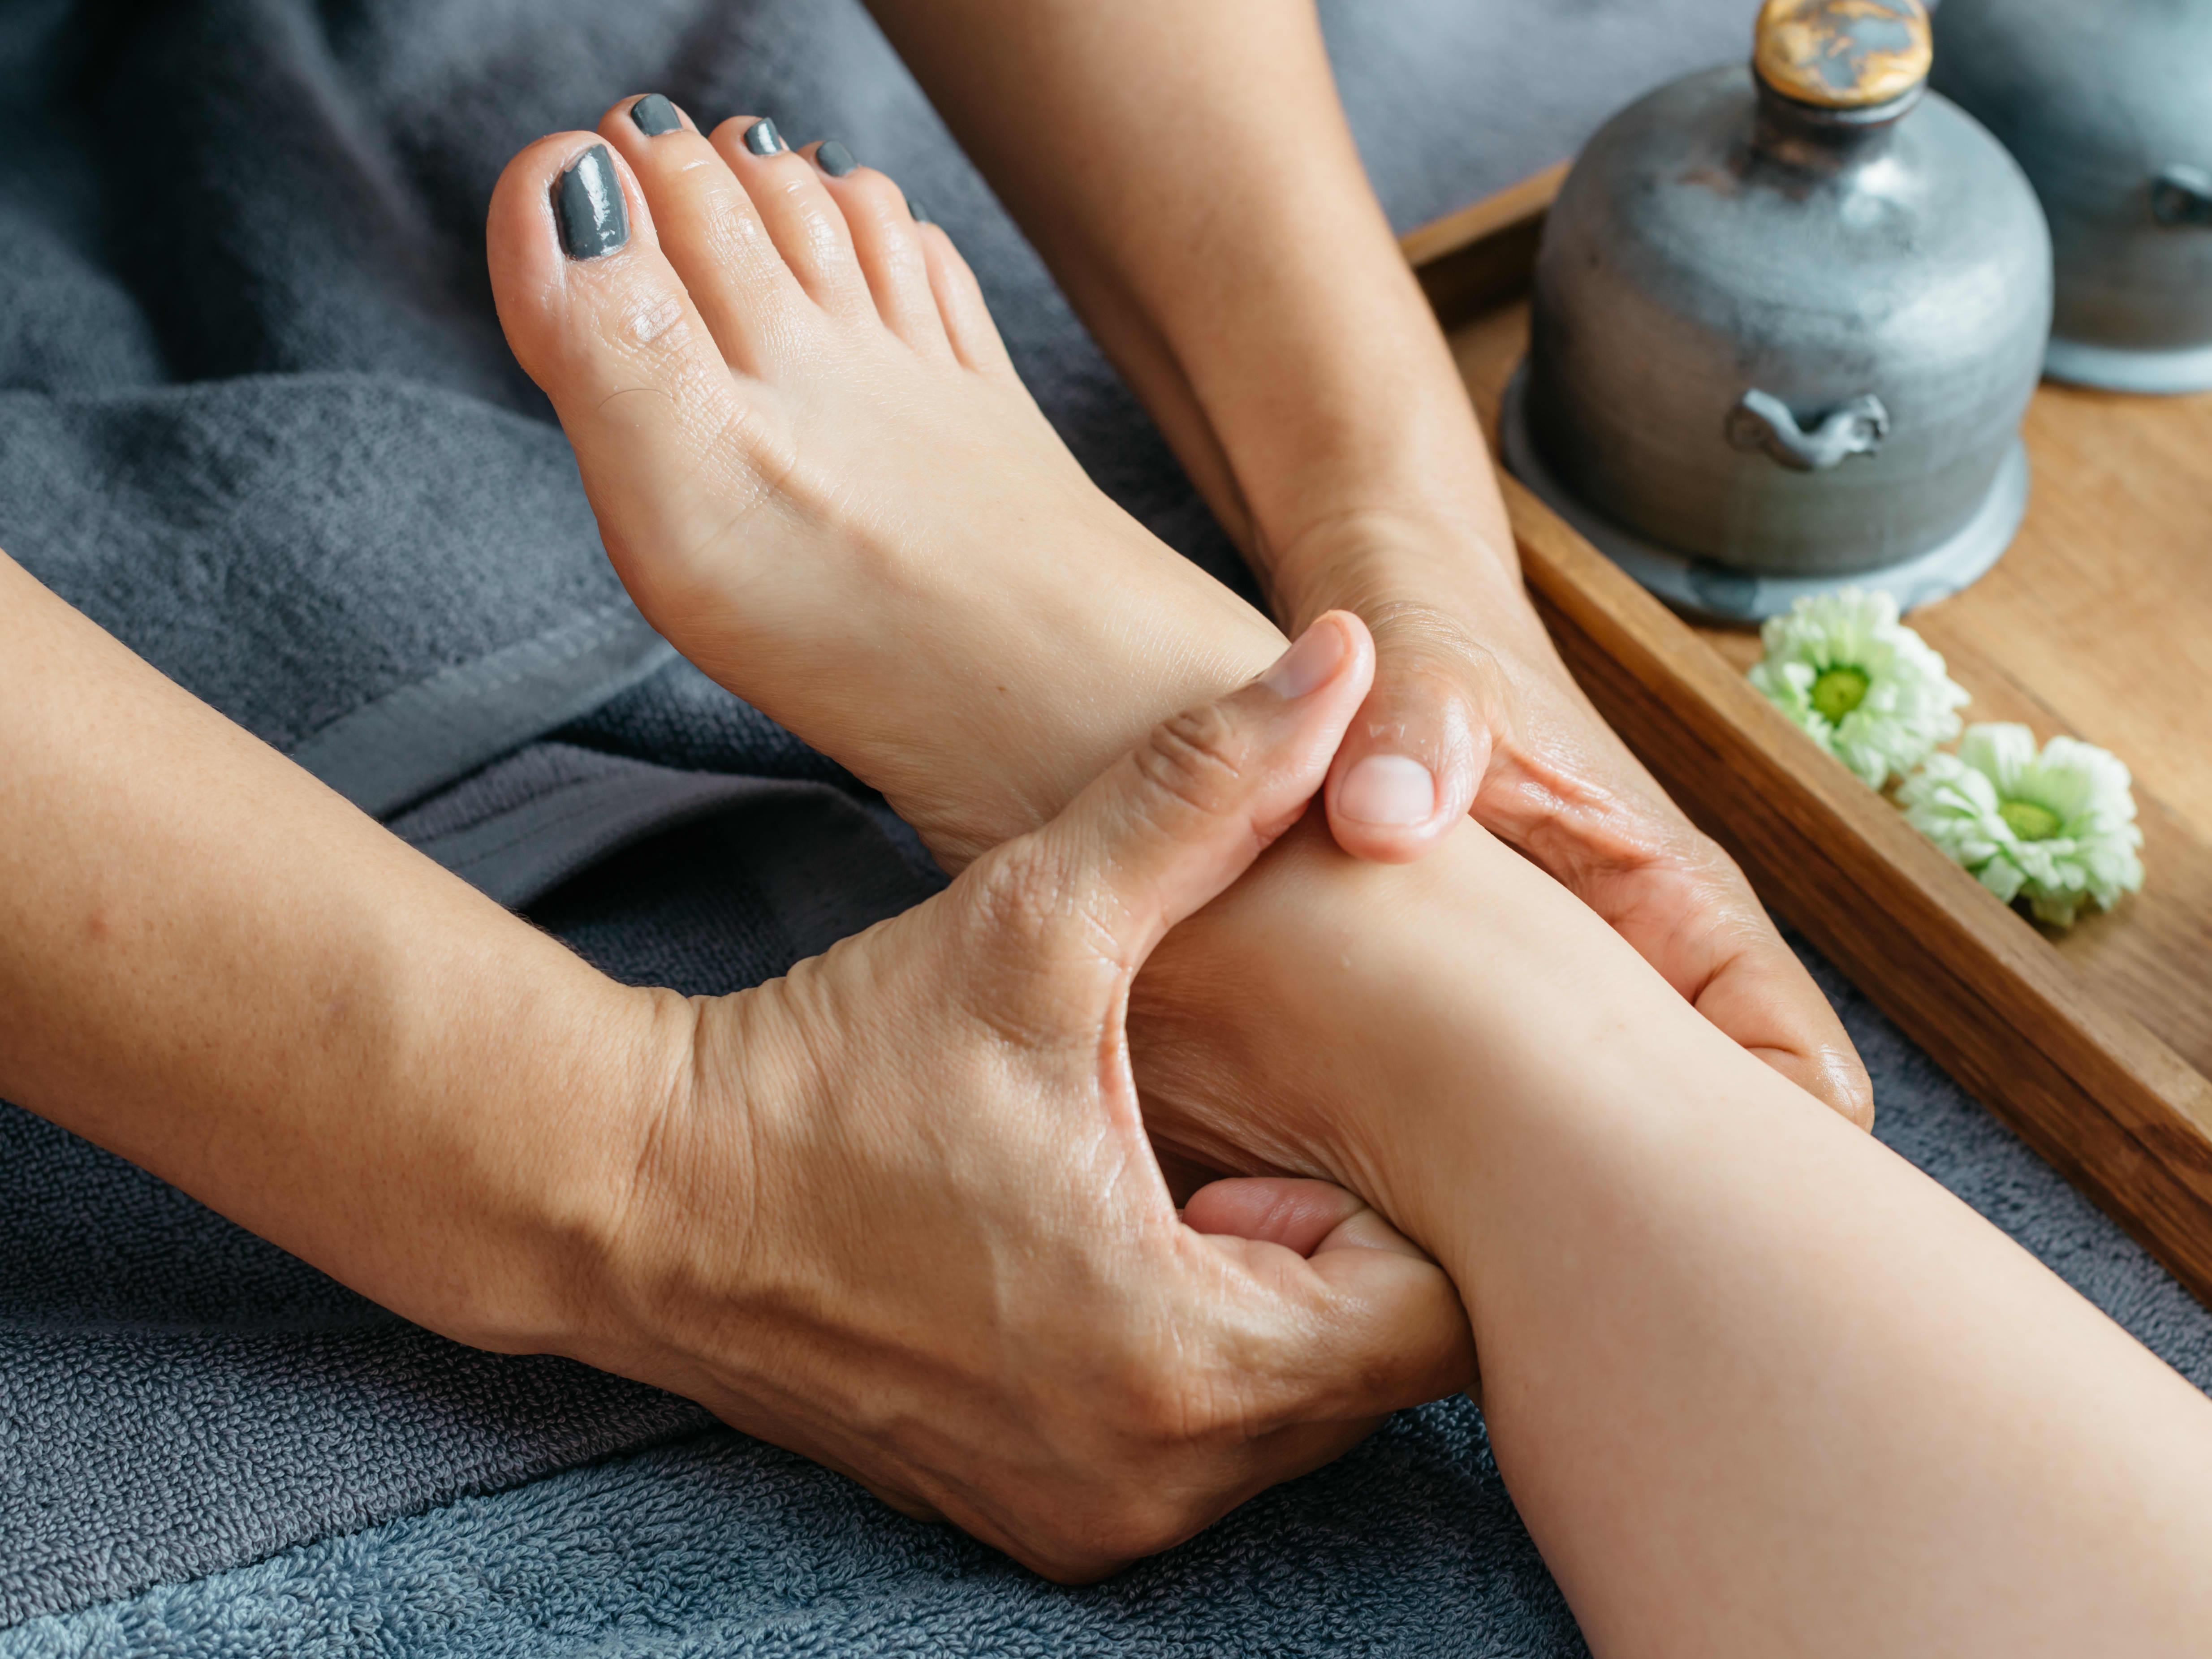 40-min Foot Massage + 20-min Neck, Shoulder Massage